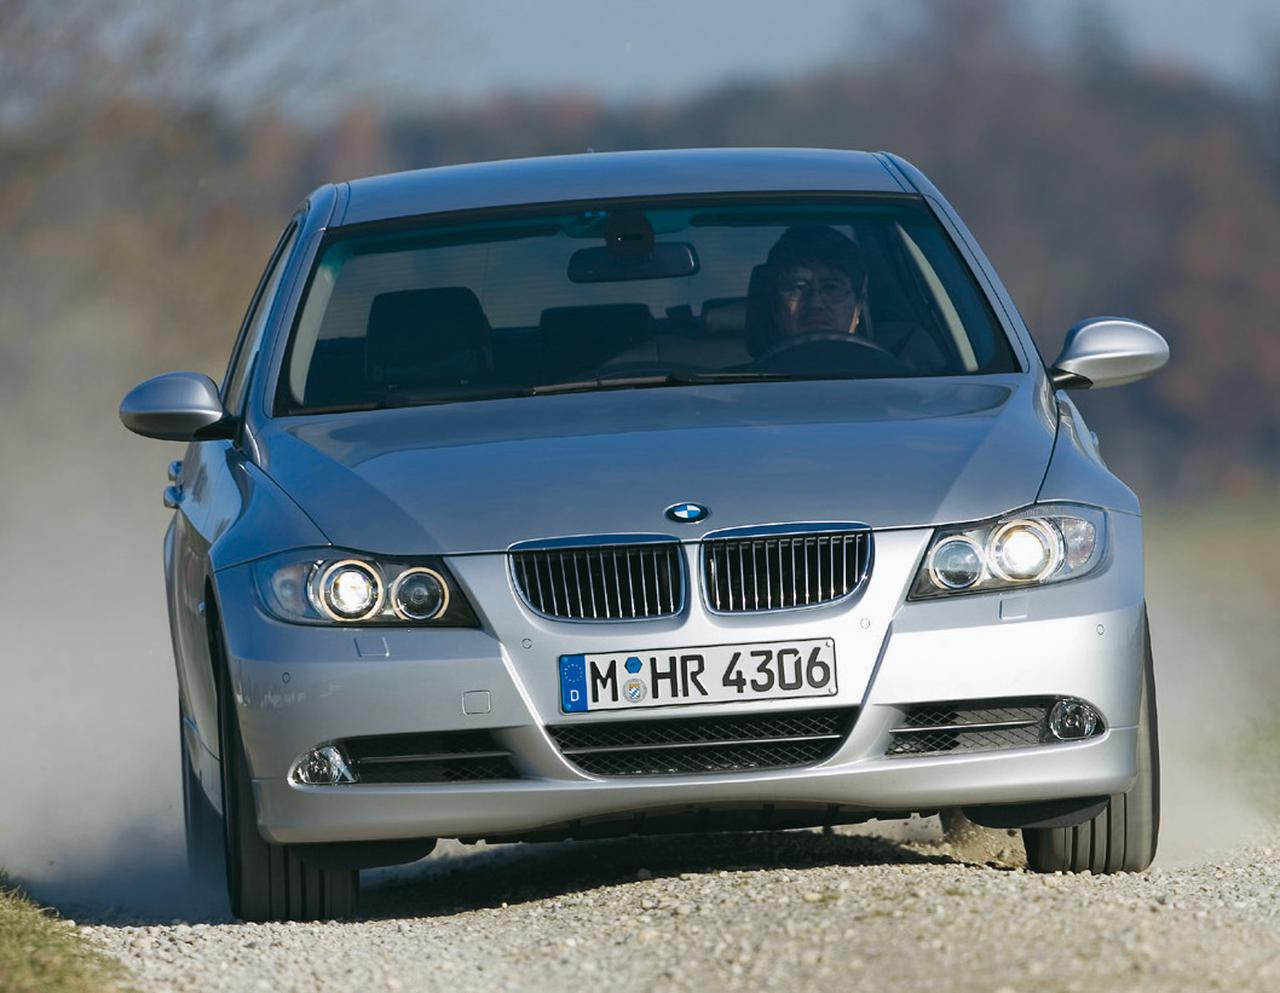 Images : 2番目の画像 - BMW 330xiと330d - Webモーターマガジン